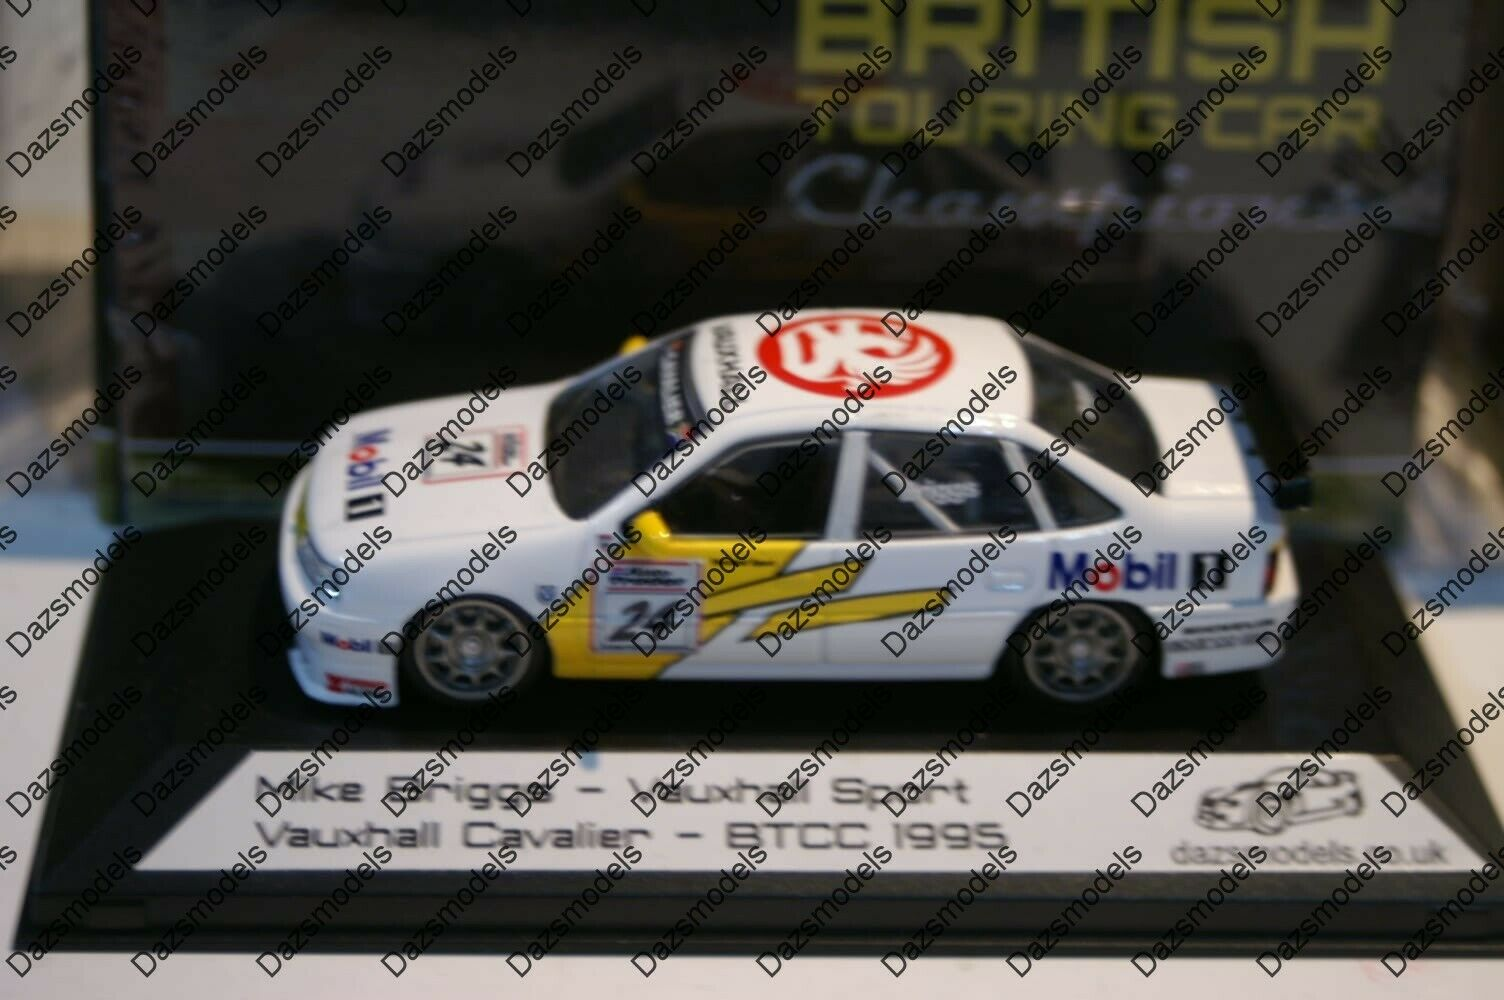 Racing Replicas code 3 Vauxhall Cavalier 1995 BTCC M. Briggs